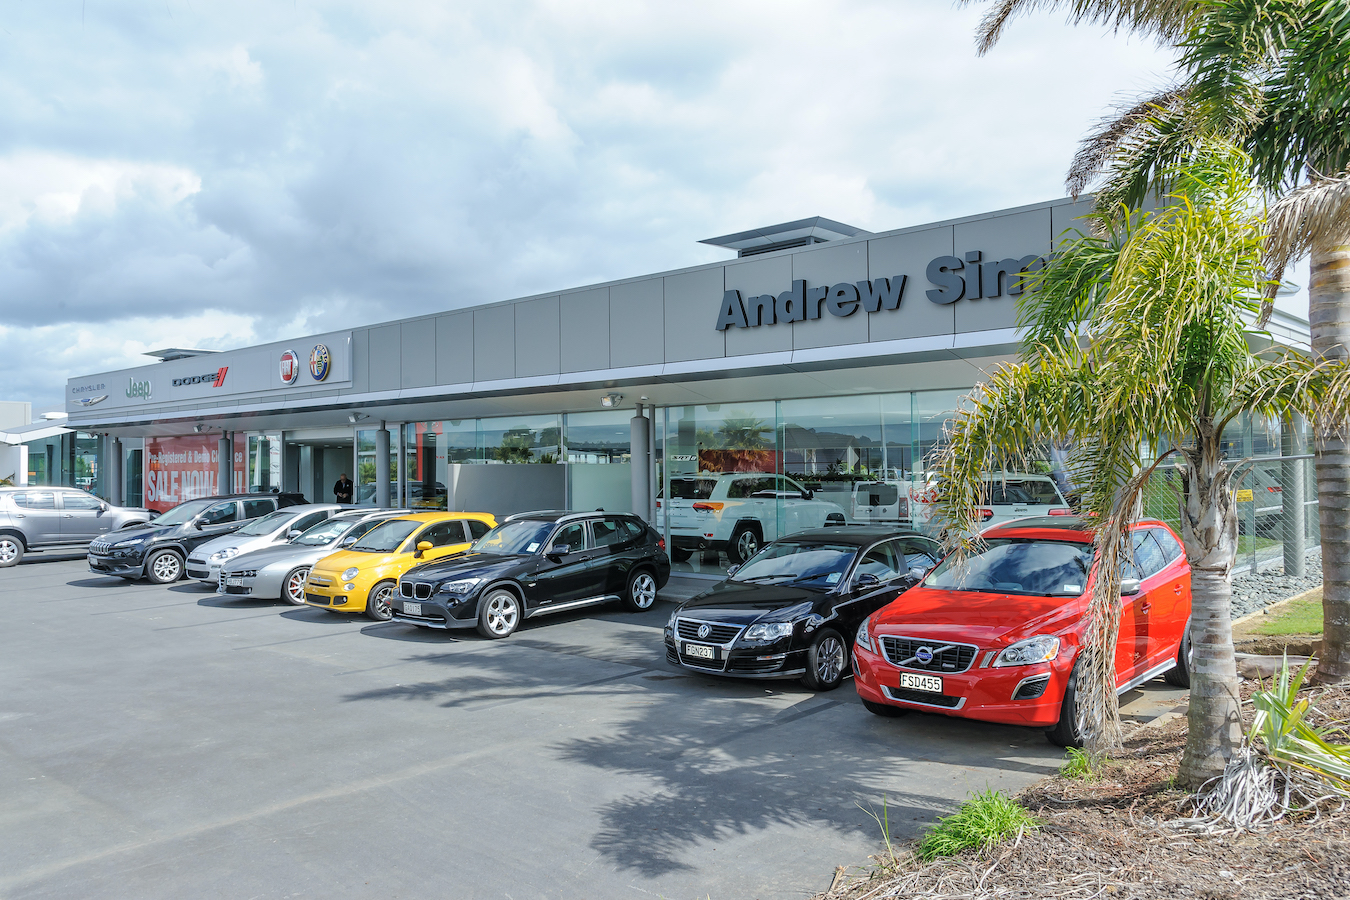 Andrew Simms Dealership - Refurbishment & Fitout